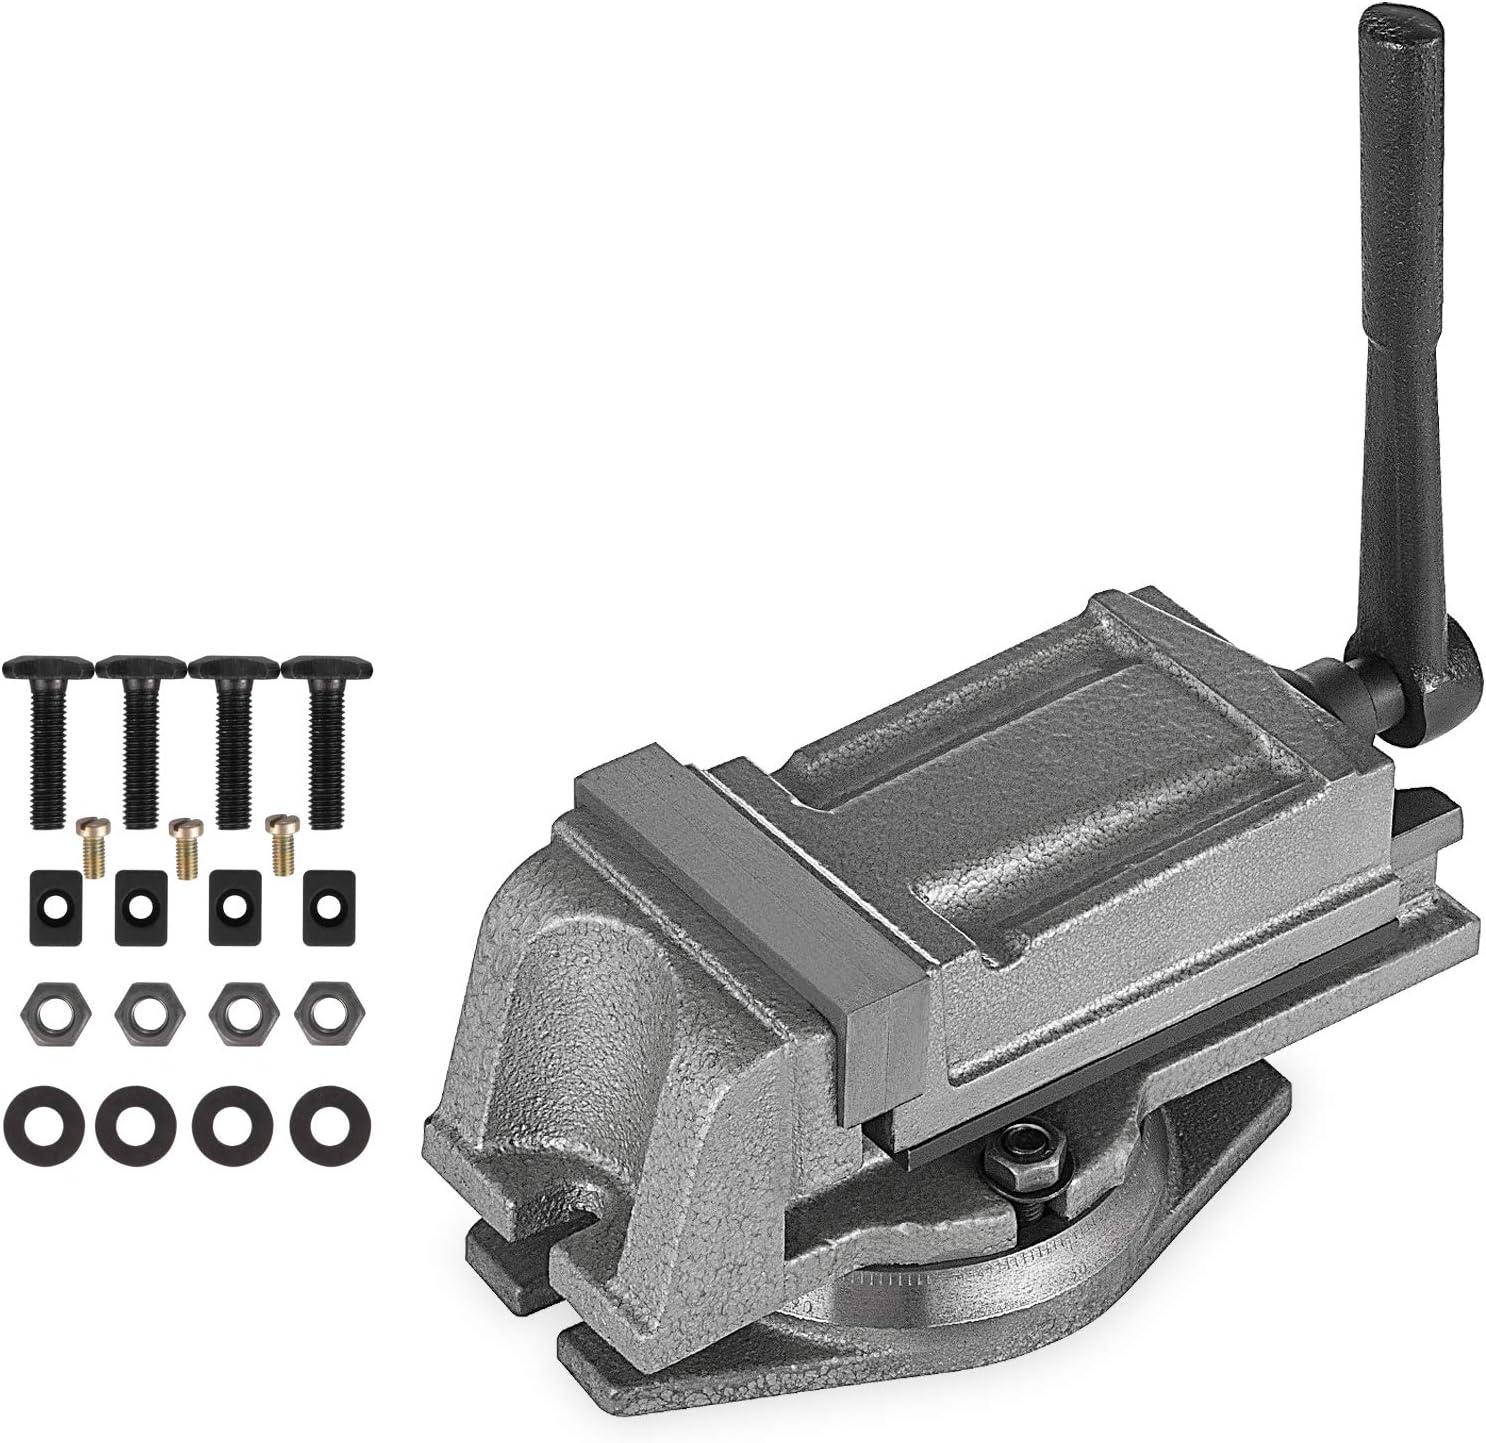 Drill Press Vice 80 mm High Precision-Steel Jaws